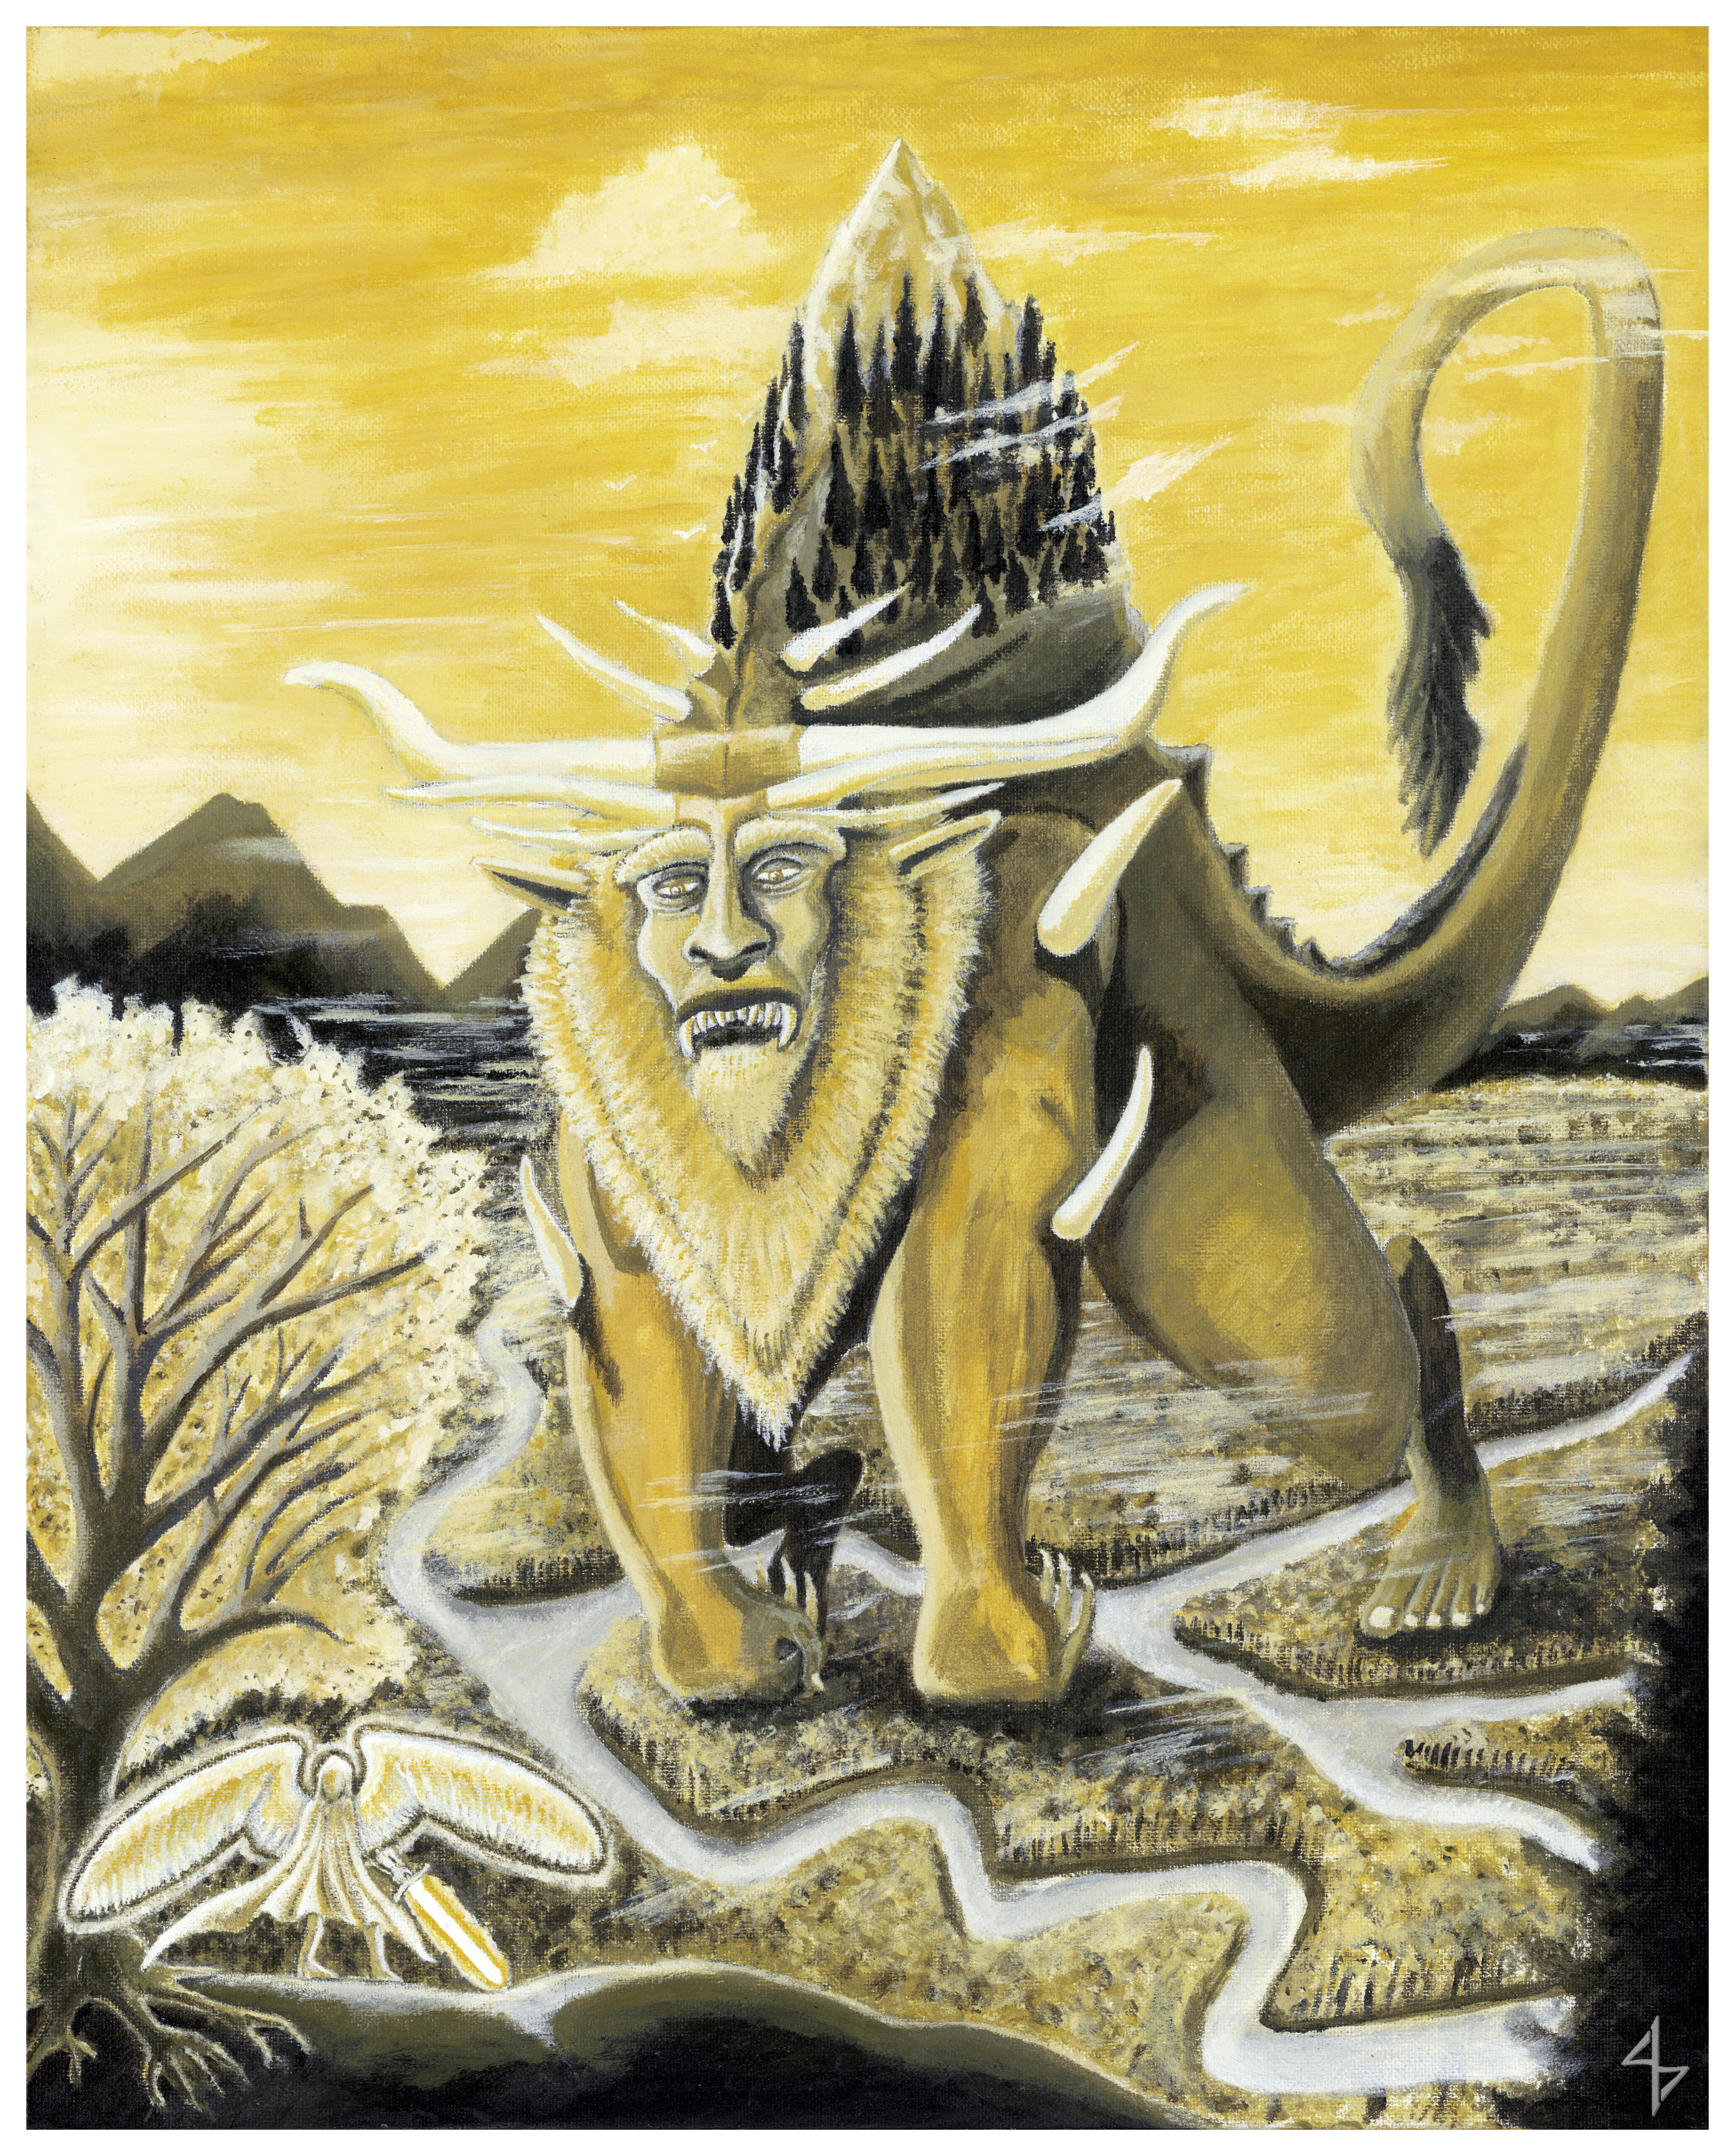 _Behemoth & the Watcher_ Watermark